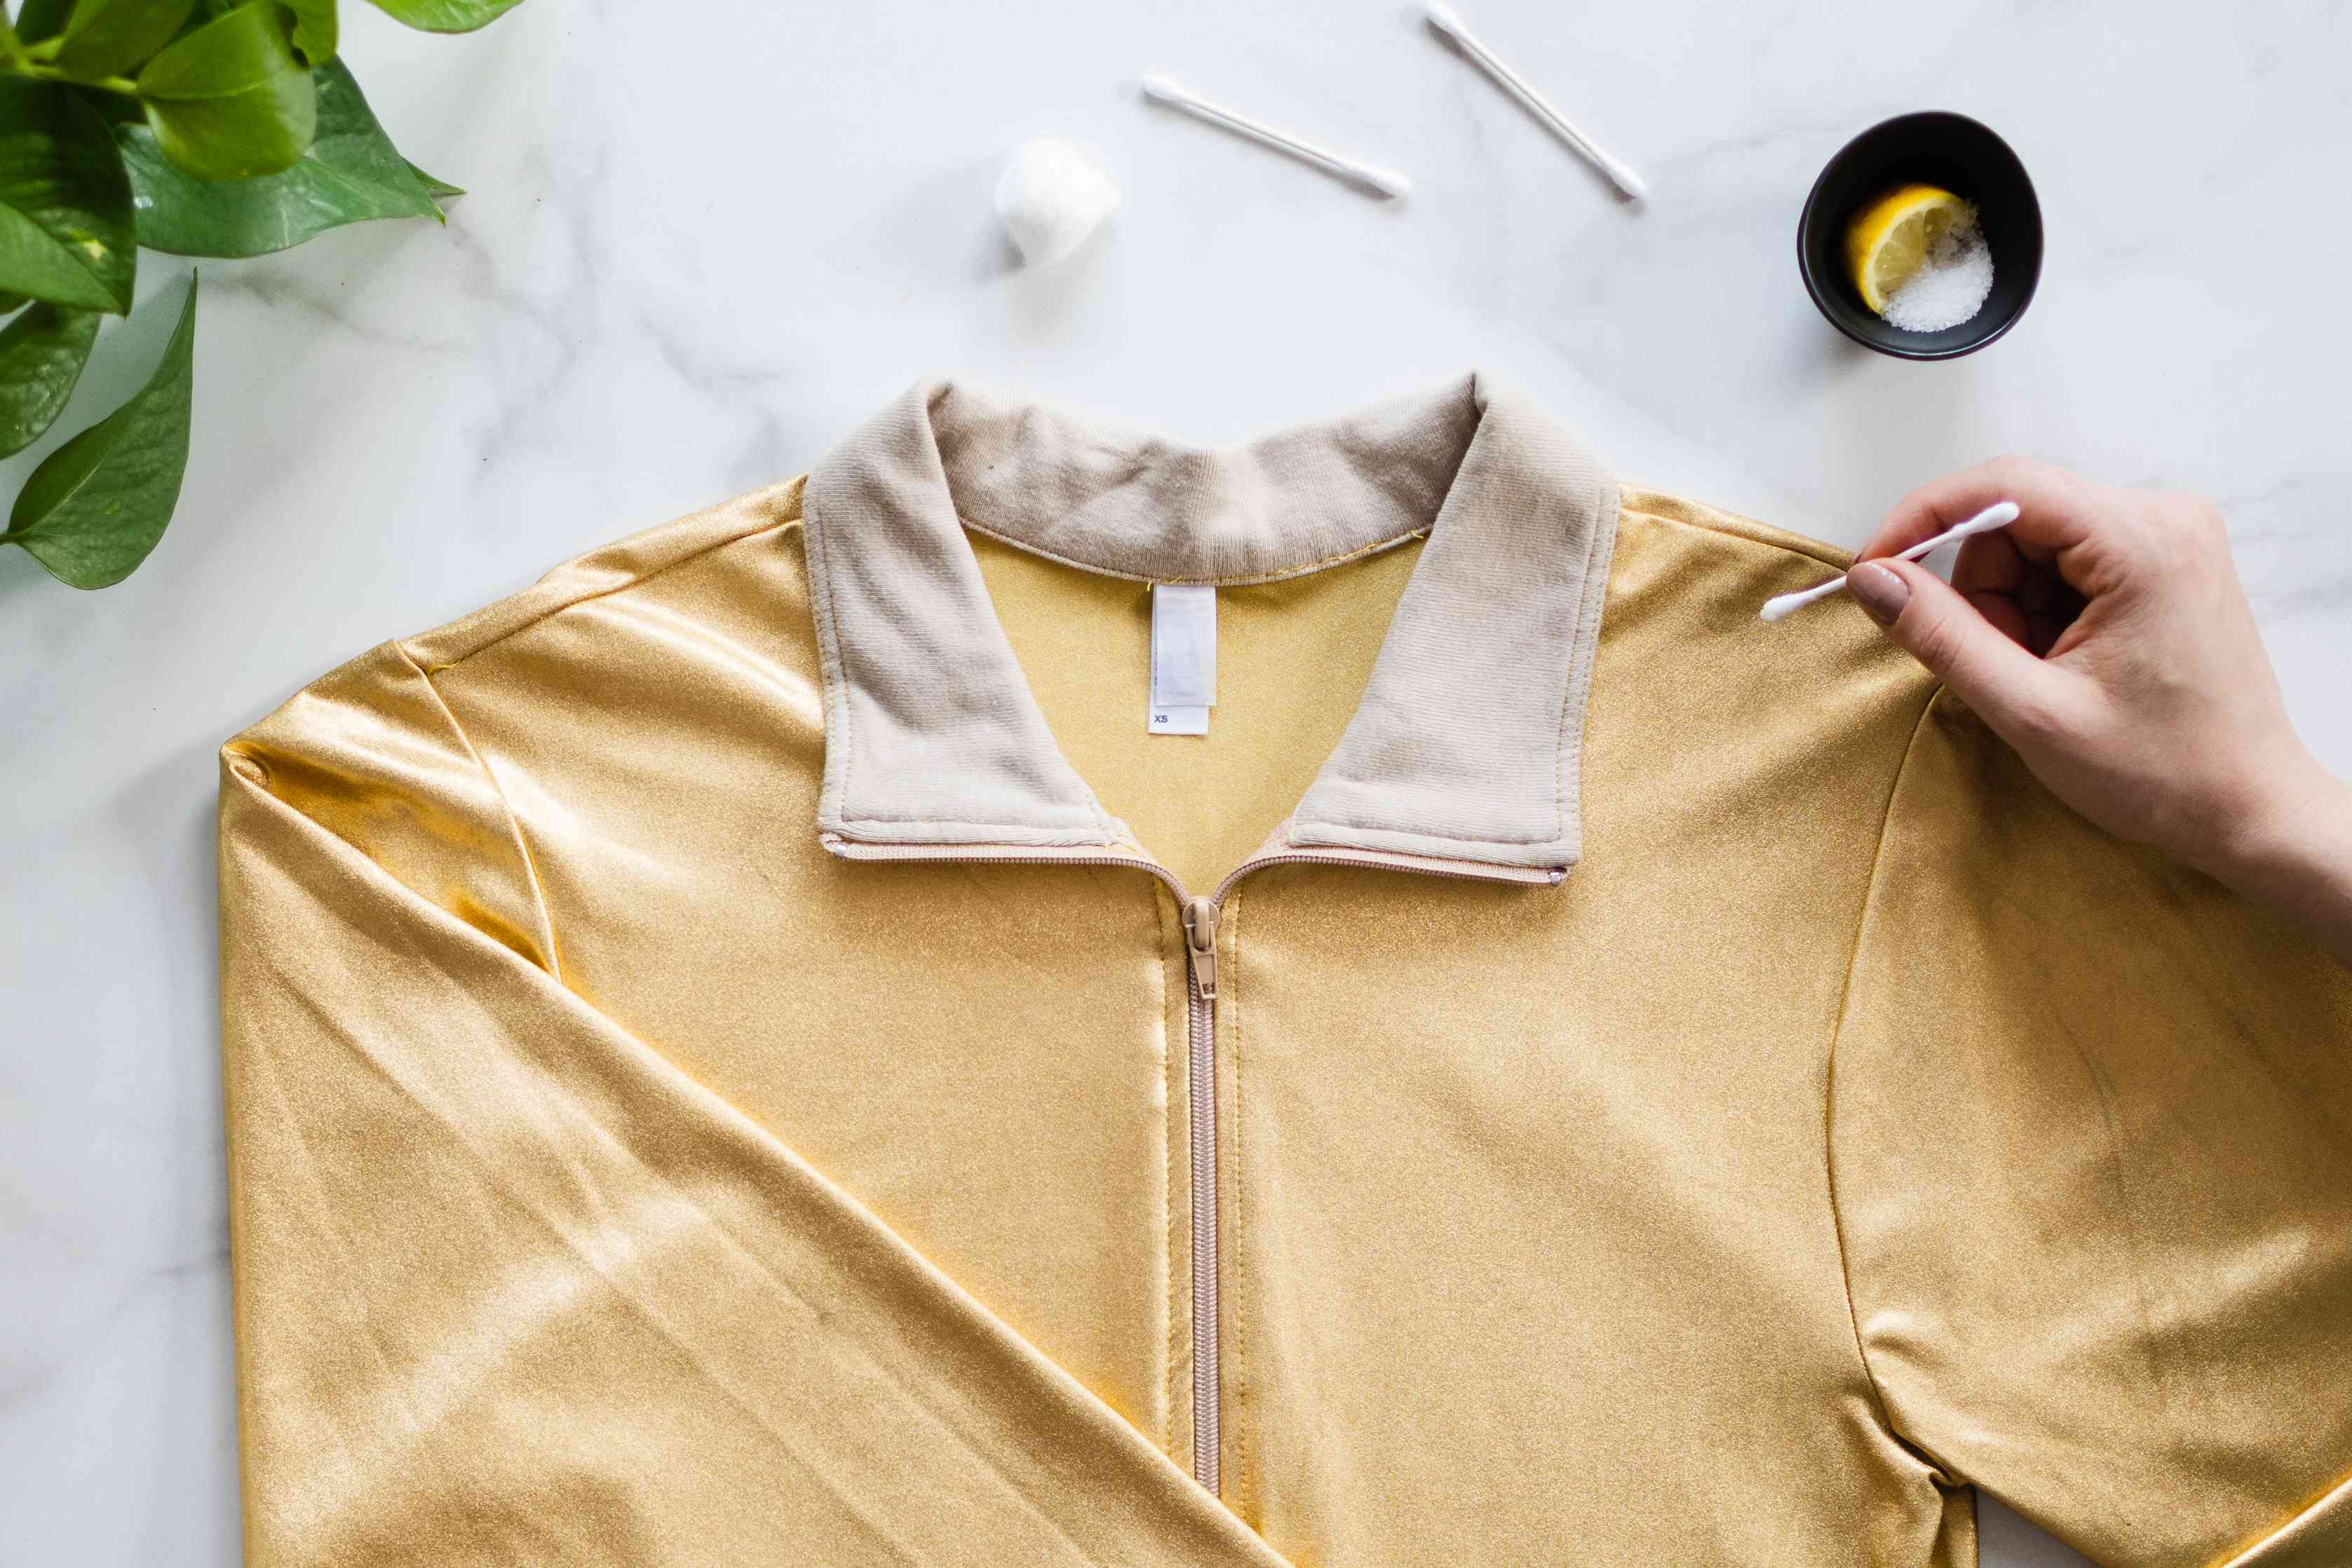 Cotton swab with lemon juice and salt applied to yarn tarnish on yellow metallic jacket